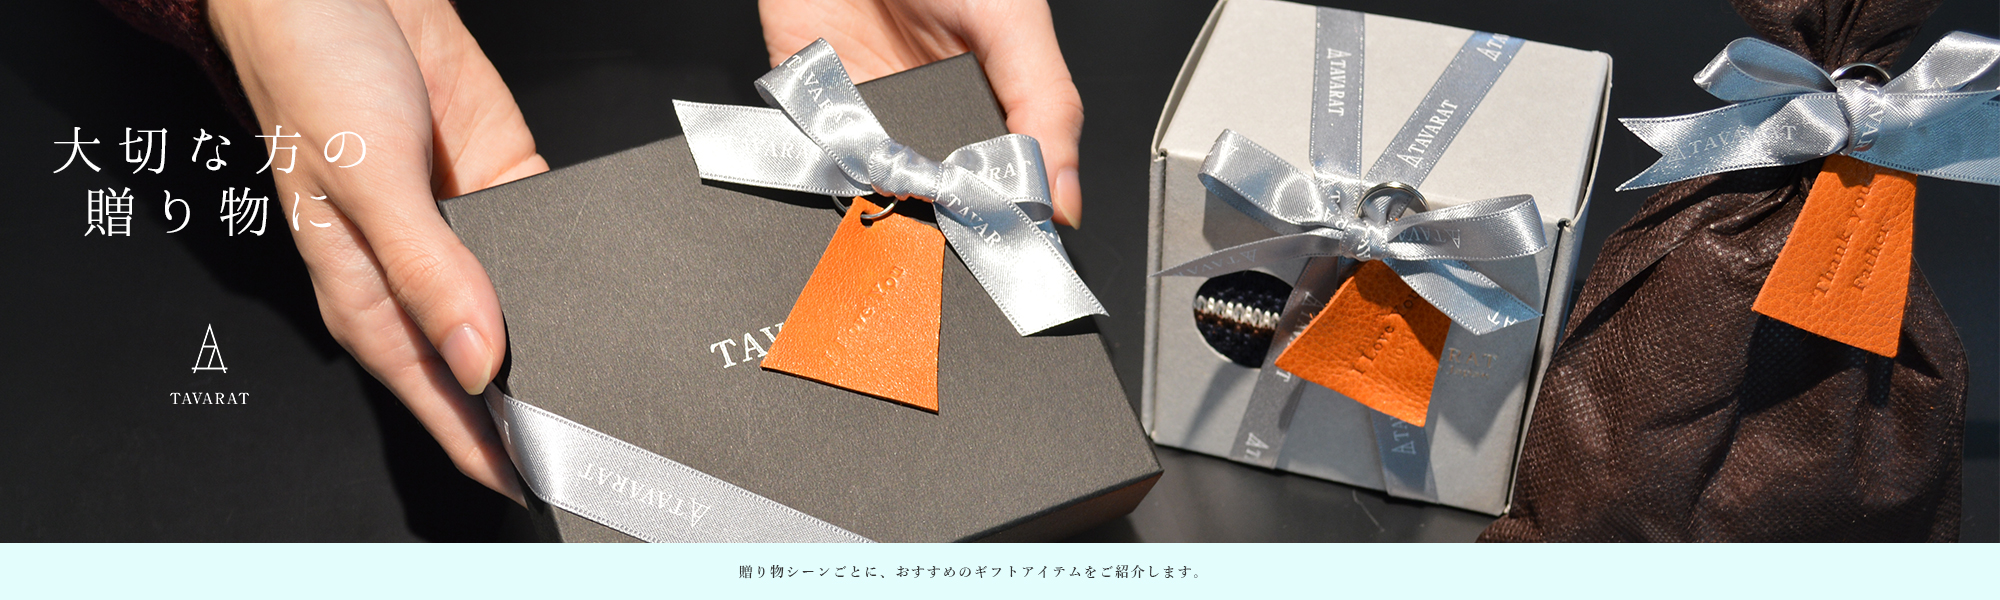 /img/gift/gift_top.jpg